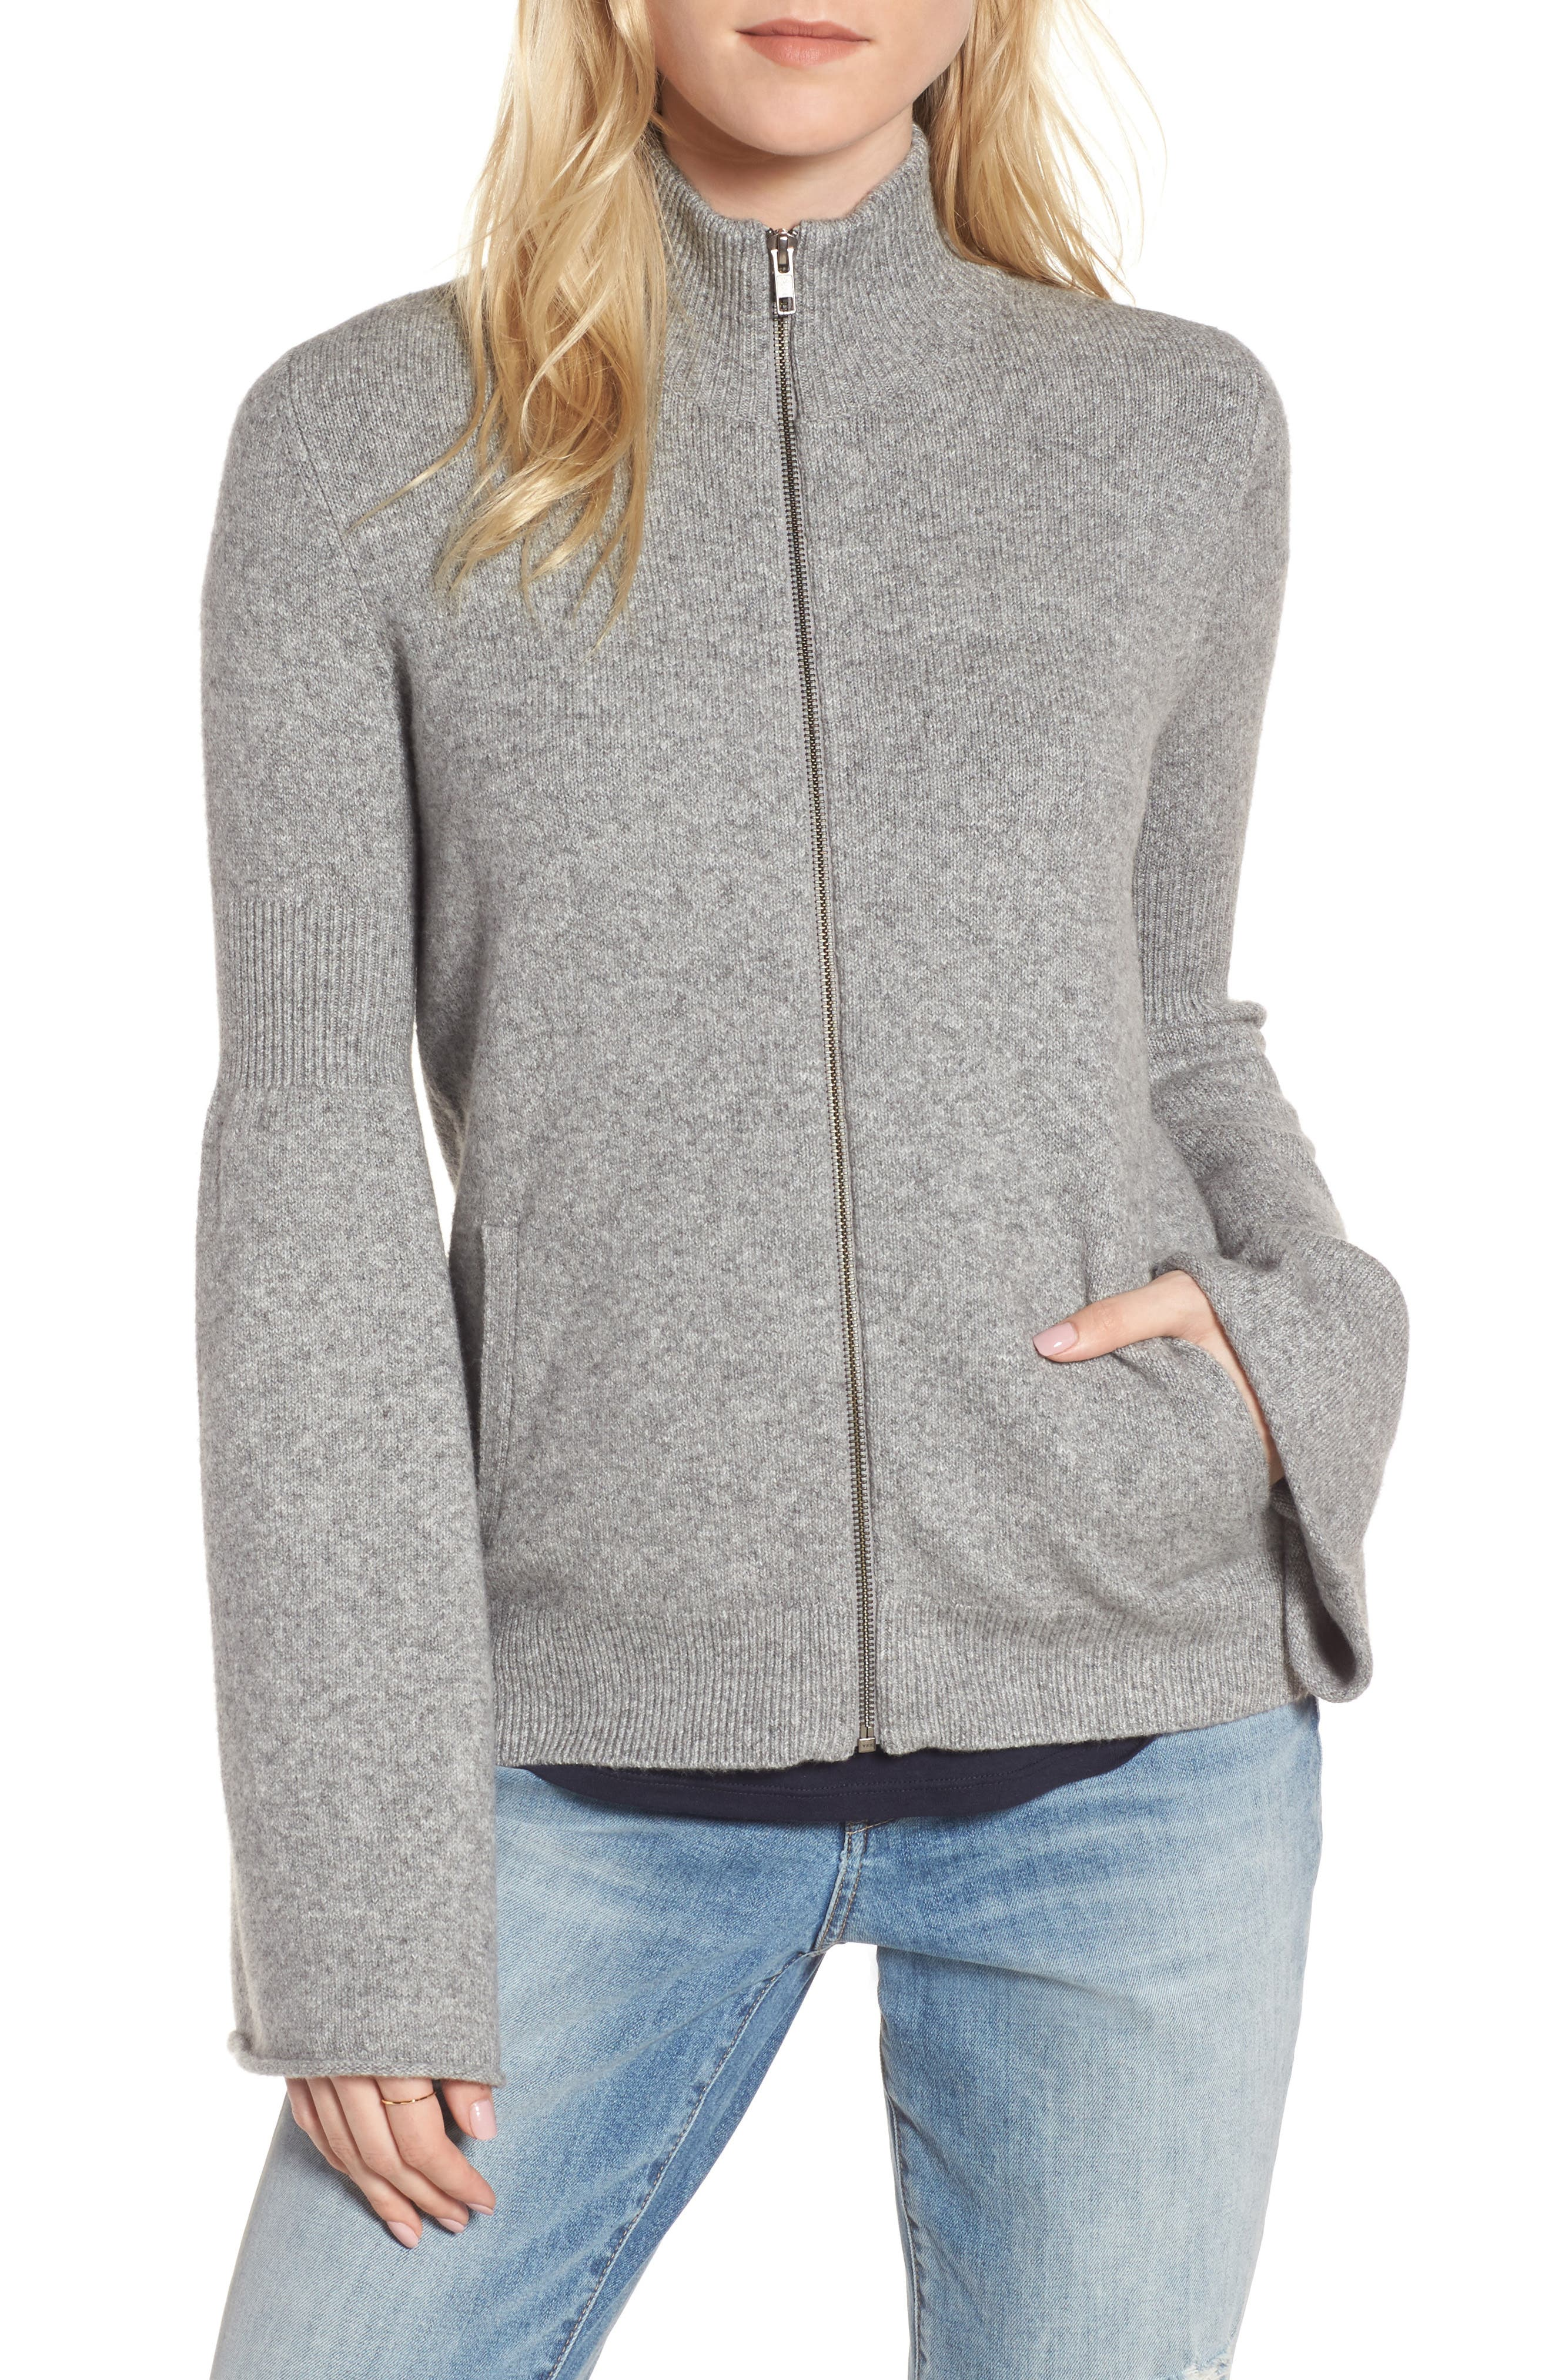 Flare Sleeve Track Jacket,                         Main,                         color, Grey Heather